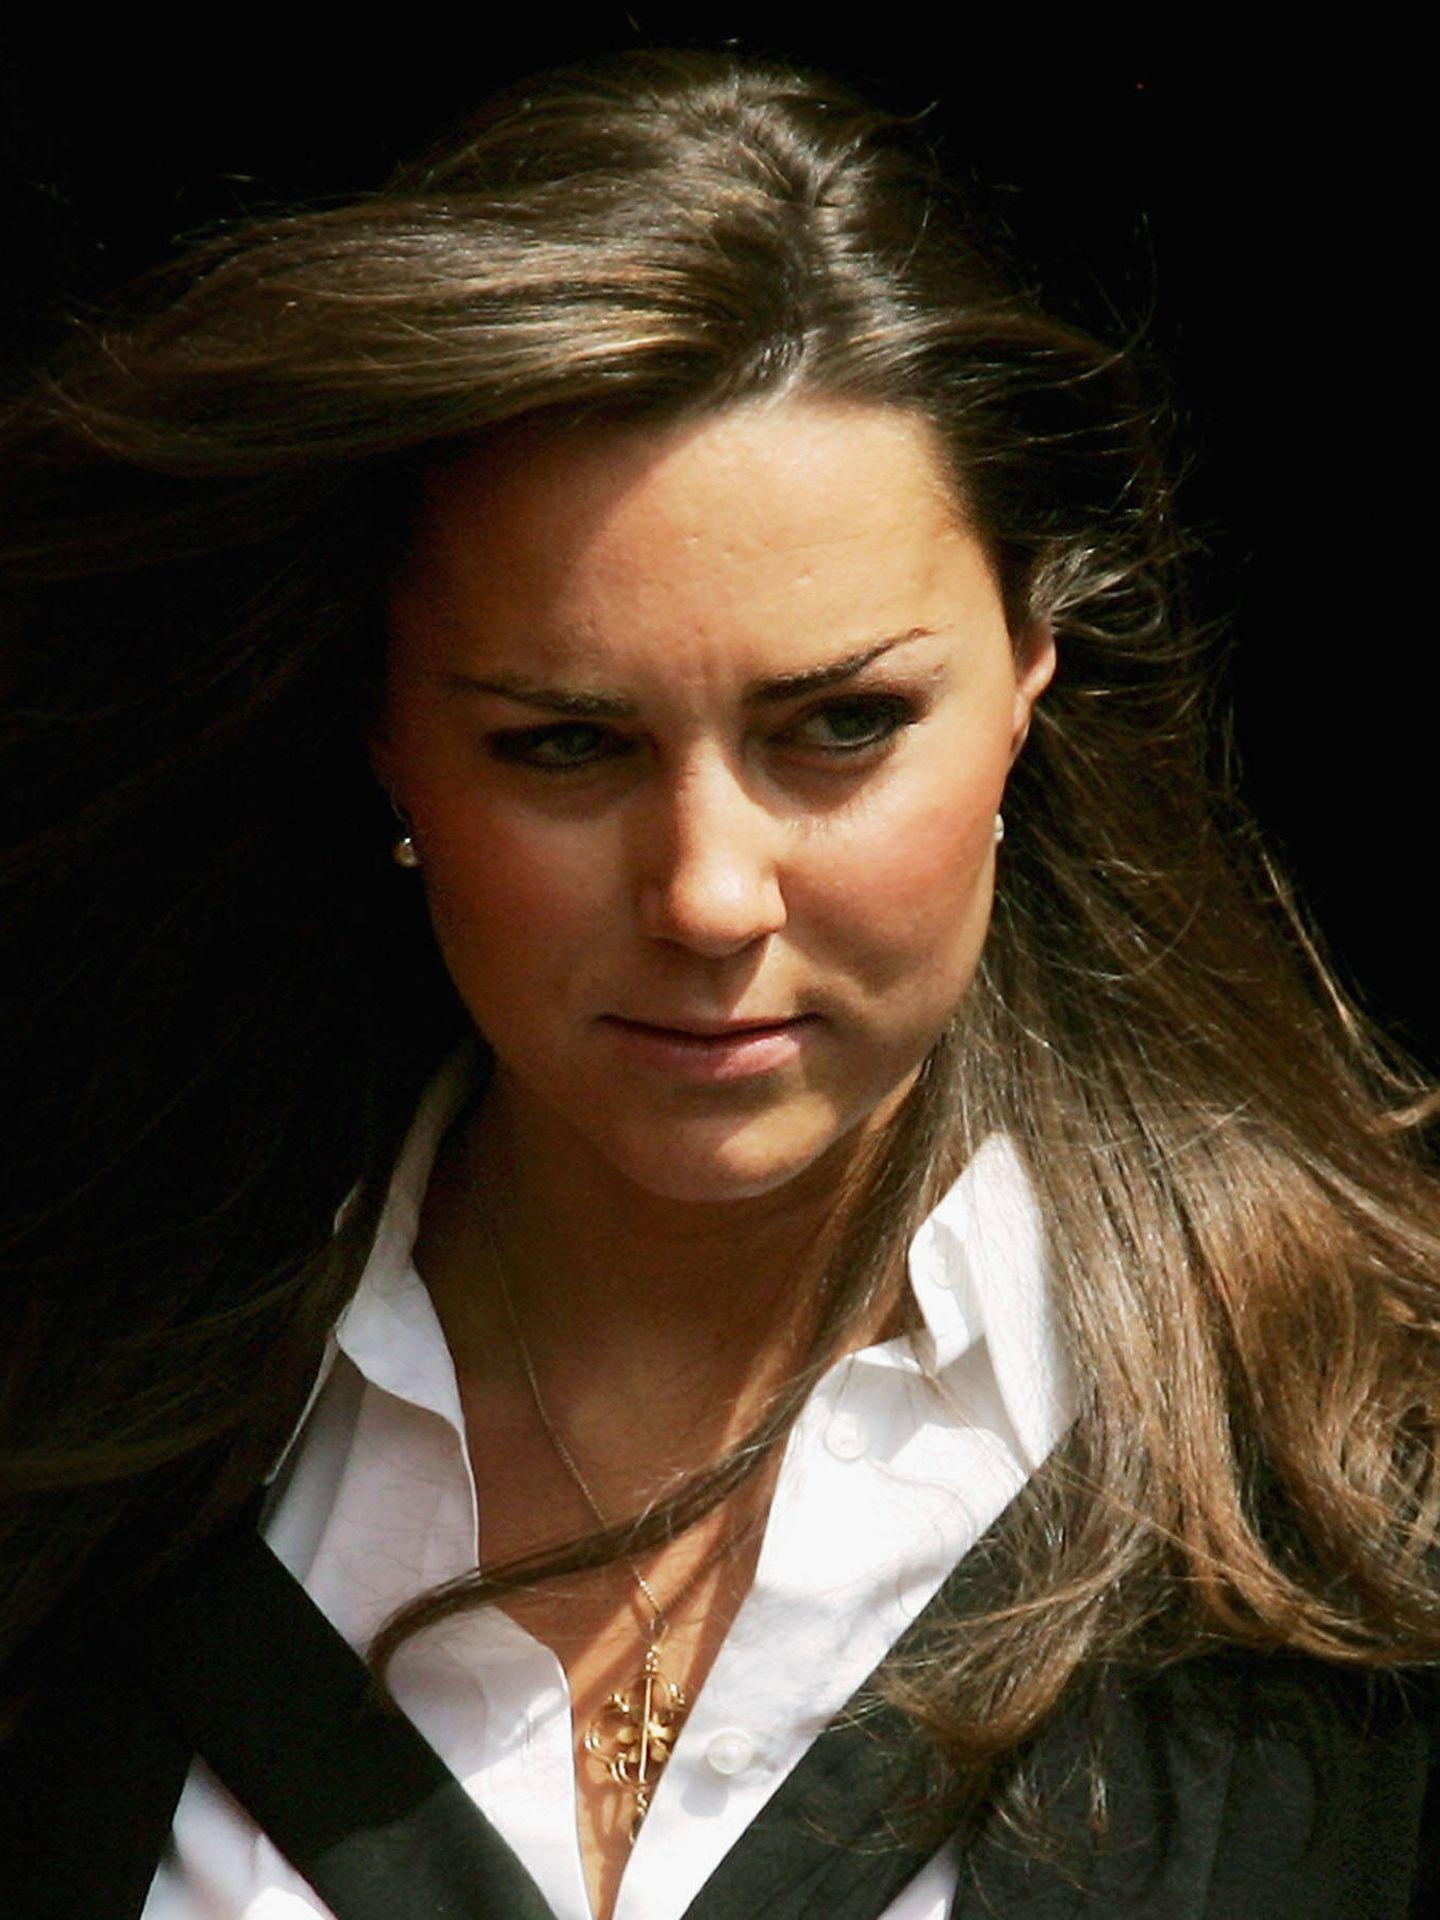 Detalle de las cejas de Kate Middleton en 2005. (Cordon Press)